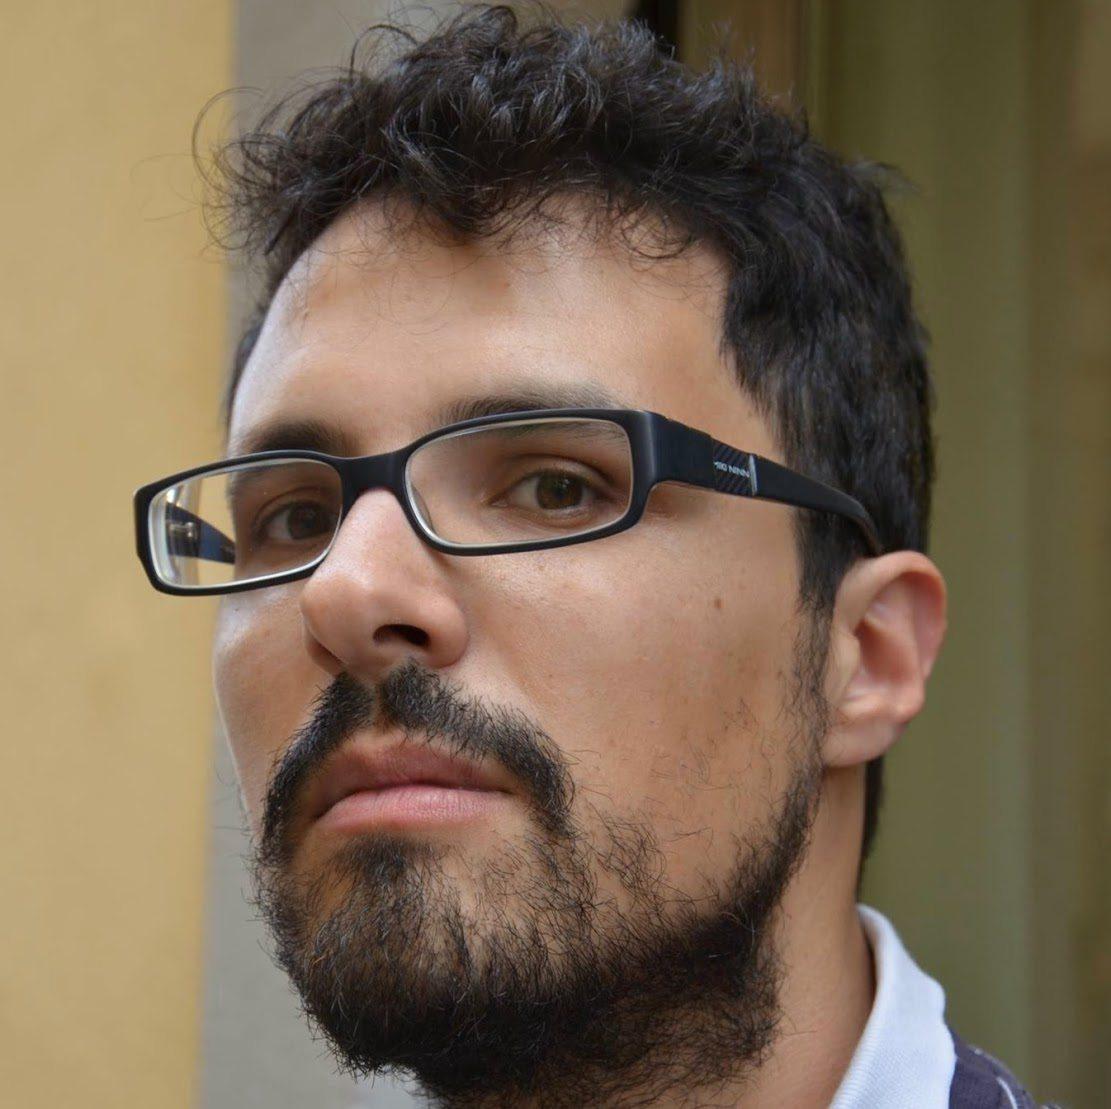 Francesco Strazzullo